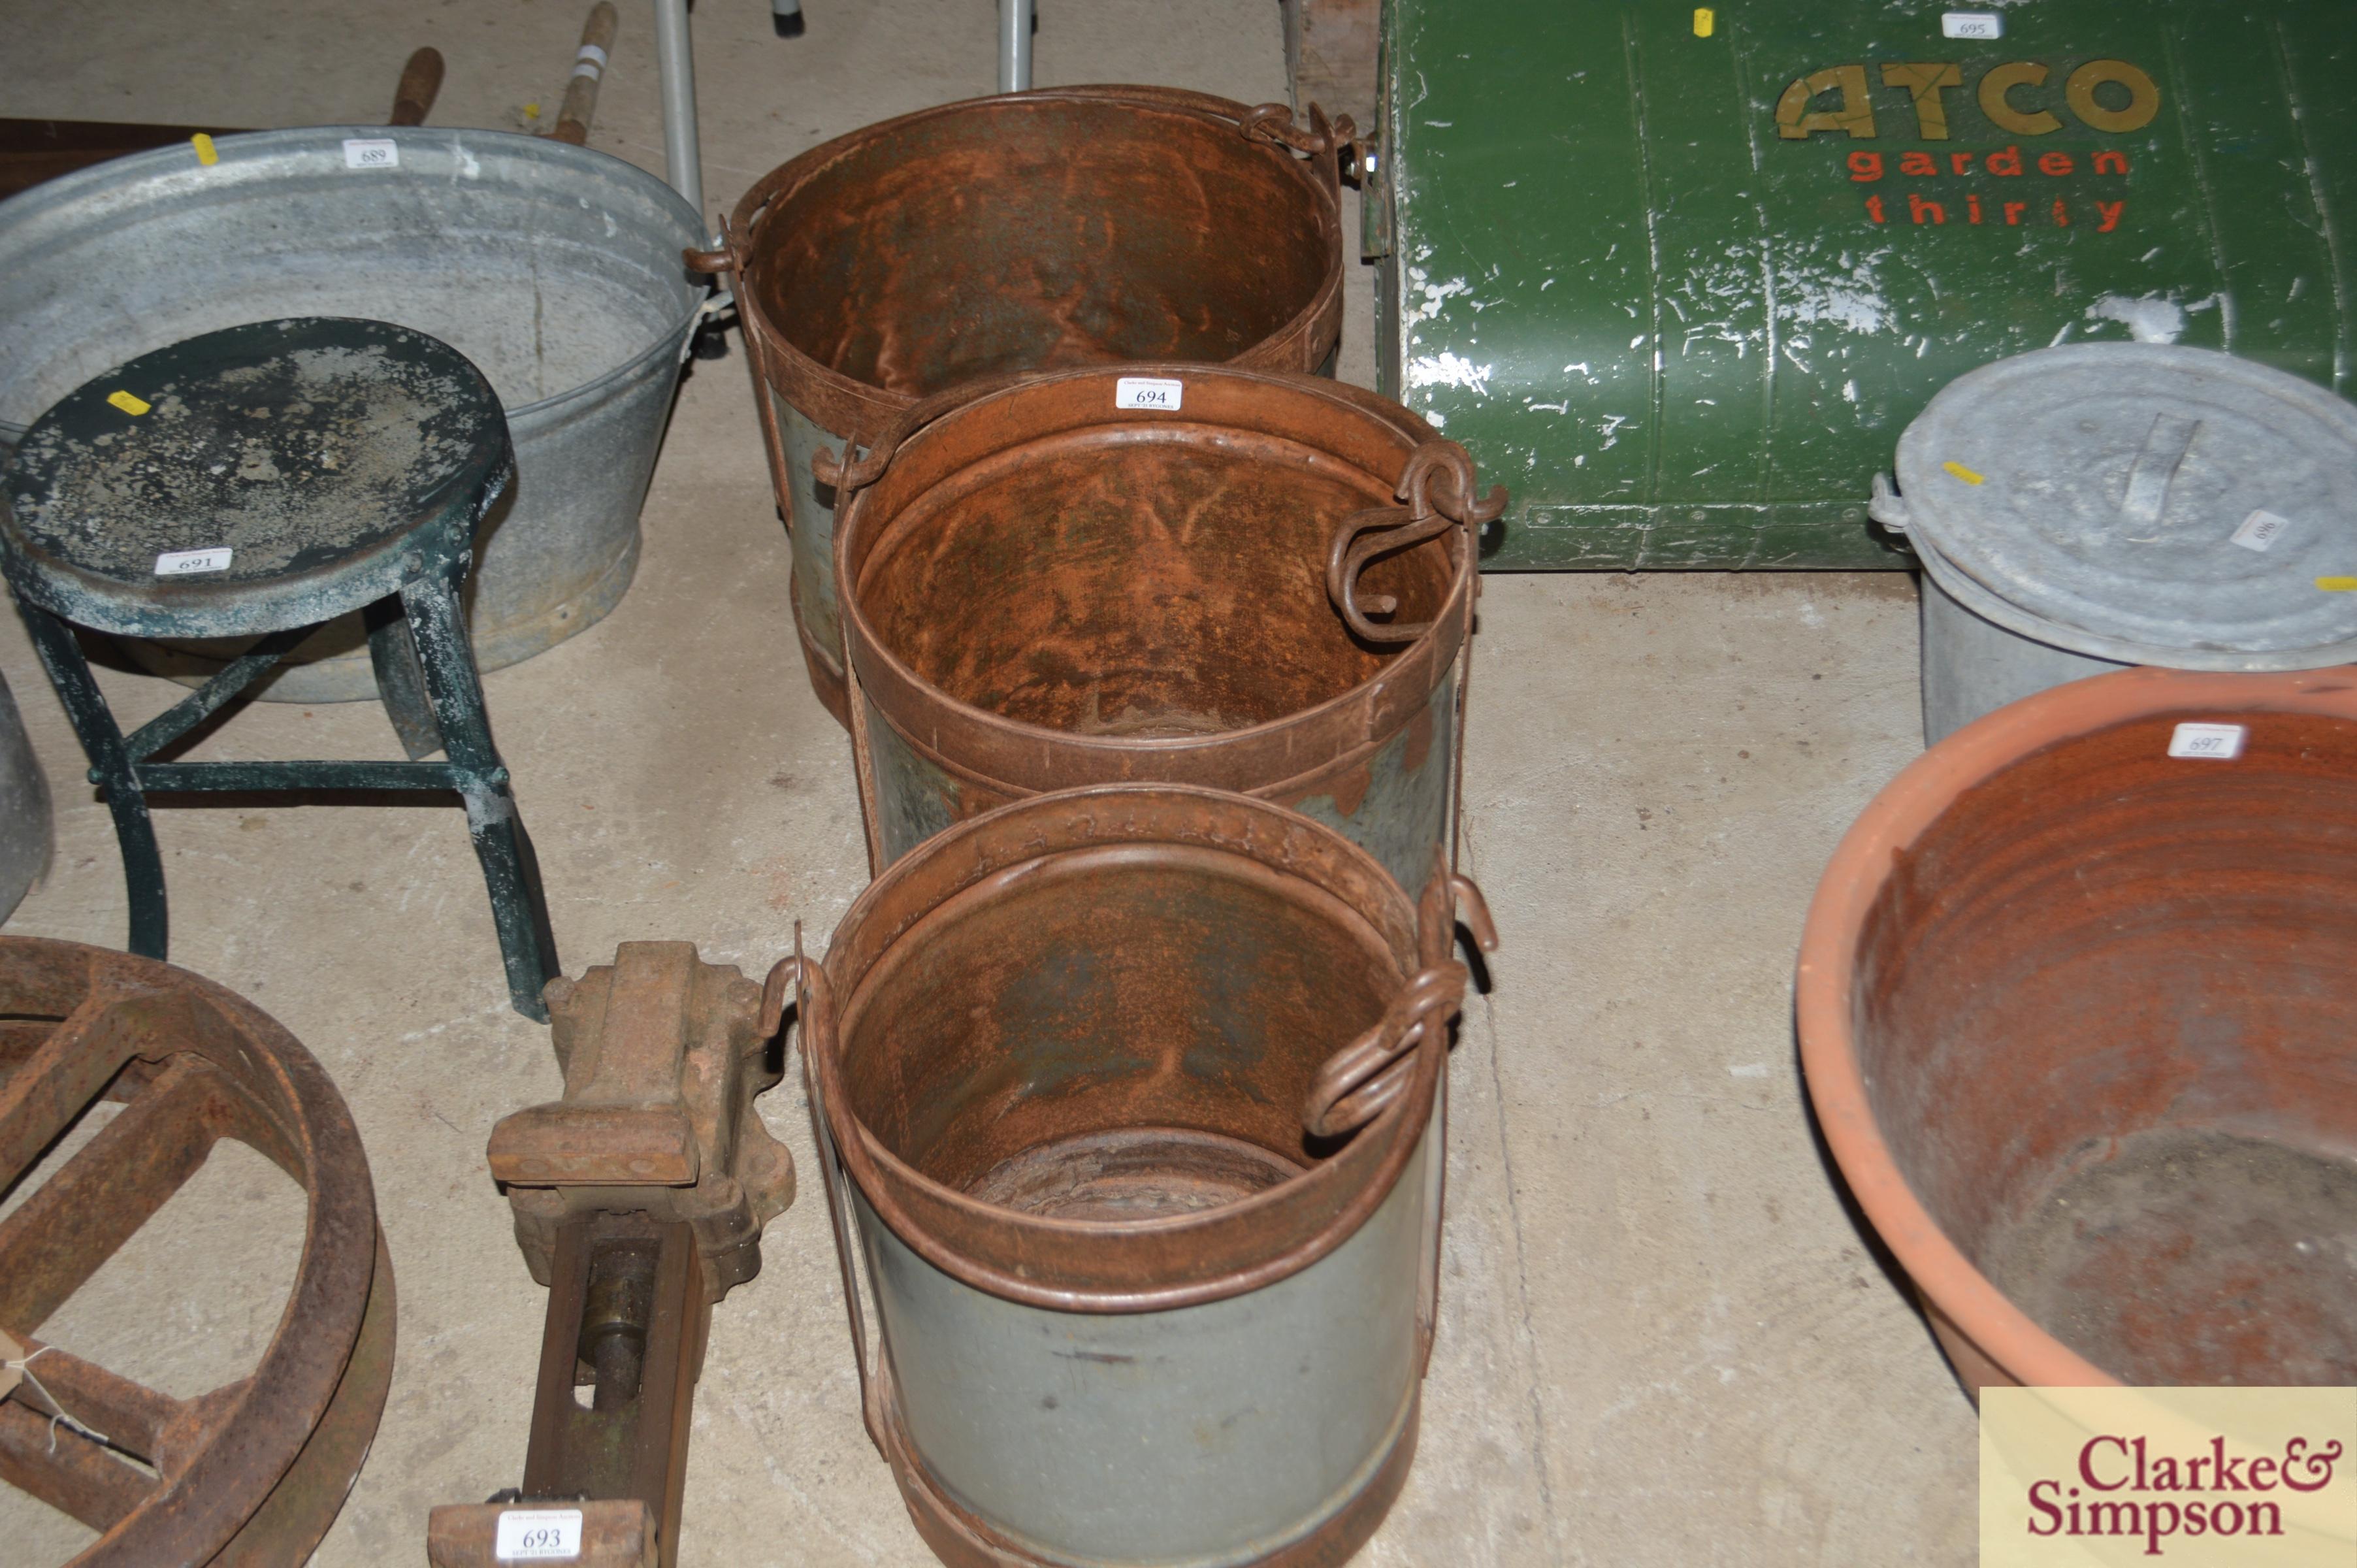 Three graduated galvanised and iron pails with swi